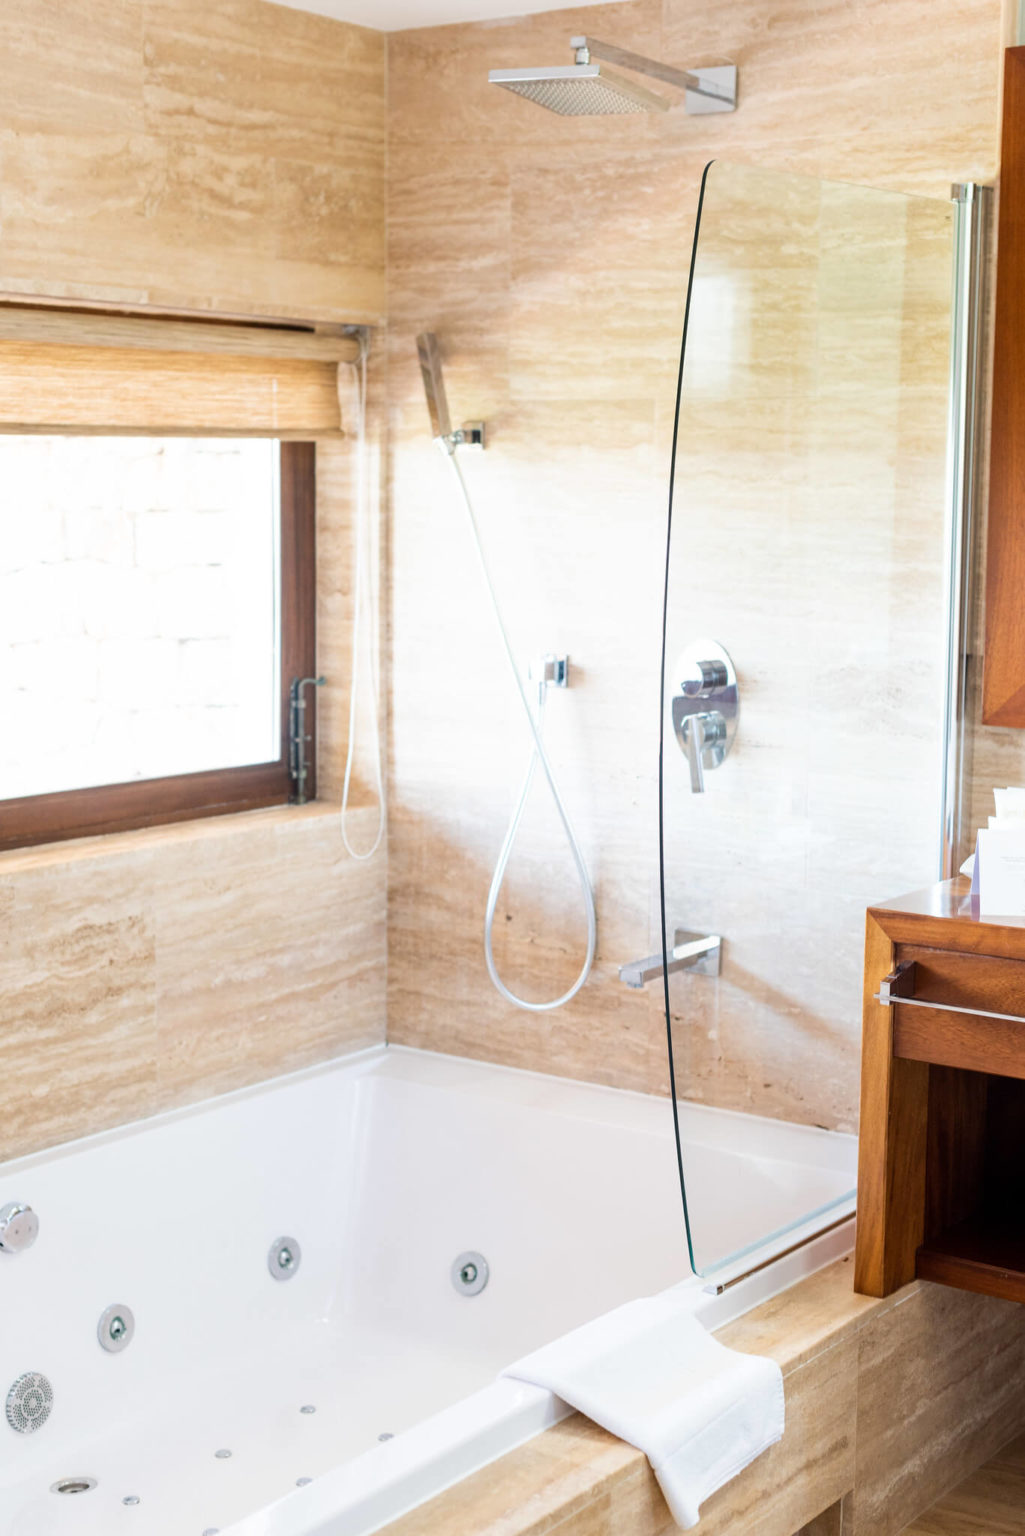 https://www.white-ibiza.com/wp-content/uploads/2020/03/white-ibiza-boutique-hotels-casa-maca-2020-05-1025x1536.jpg